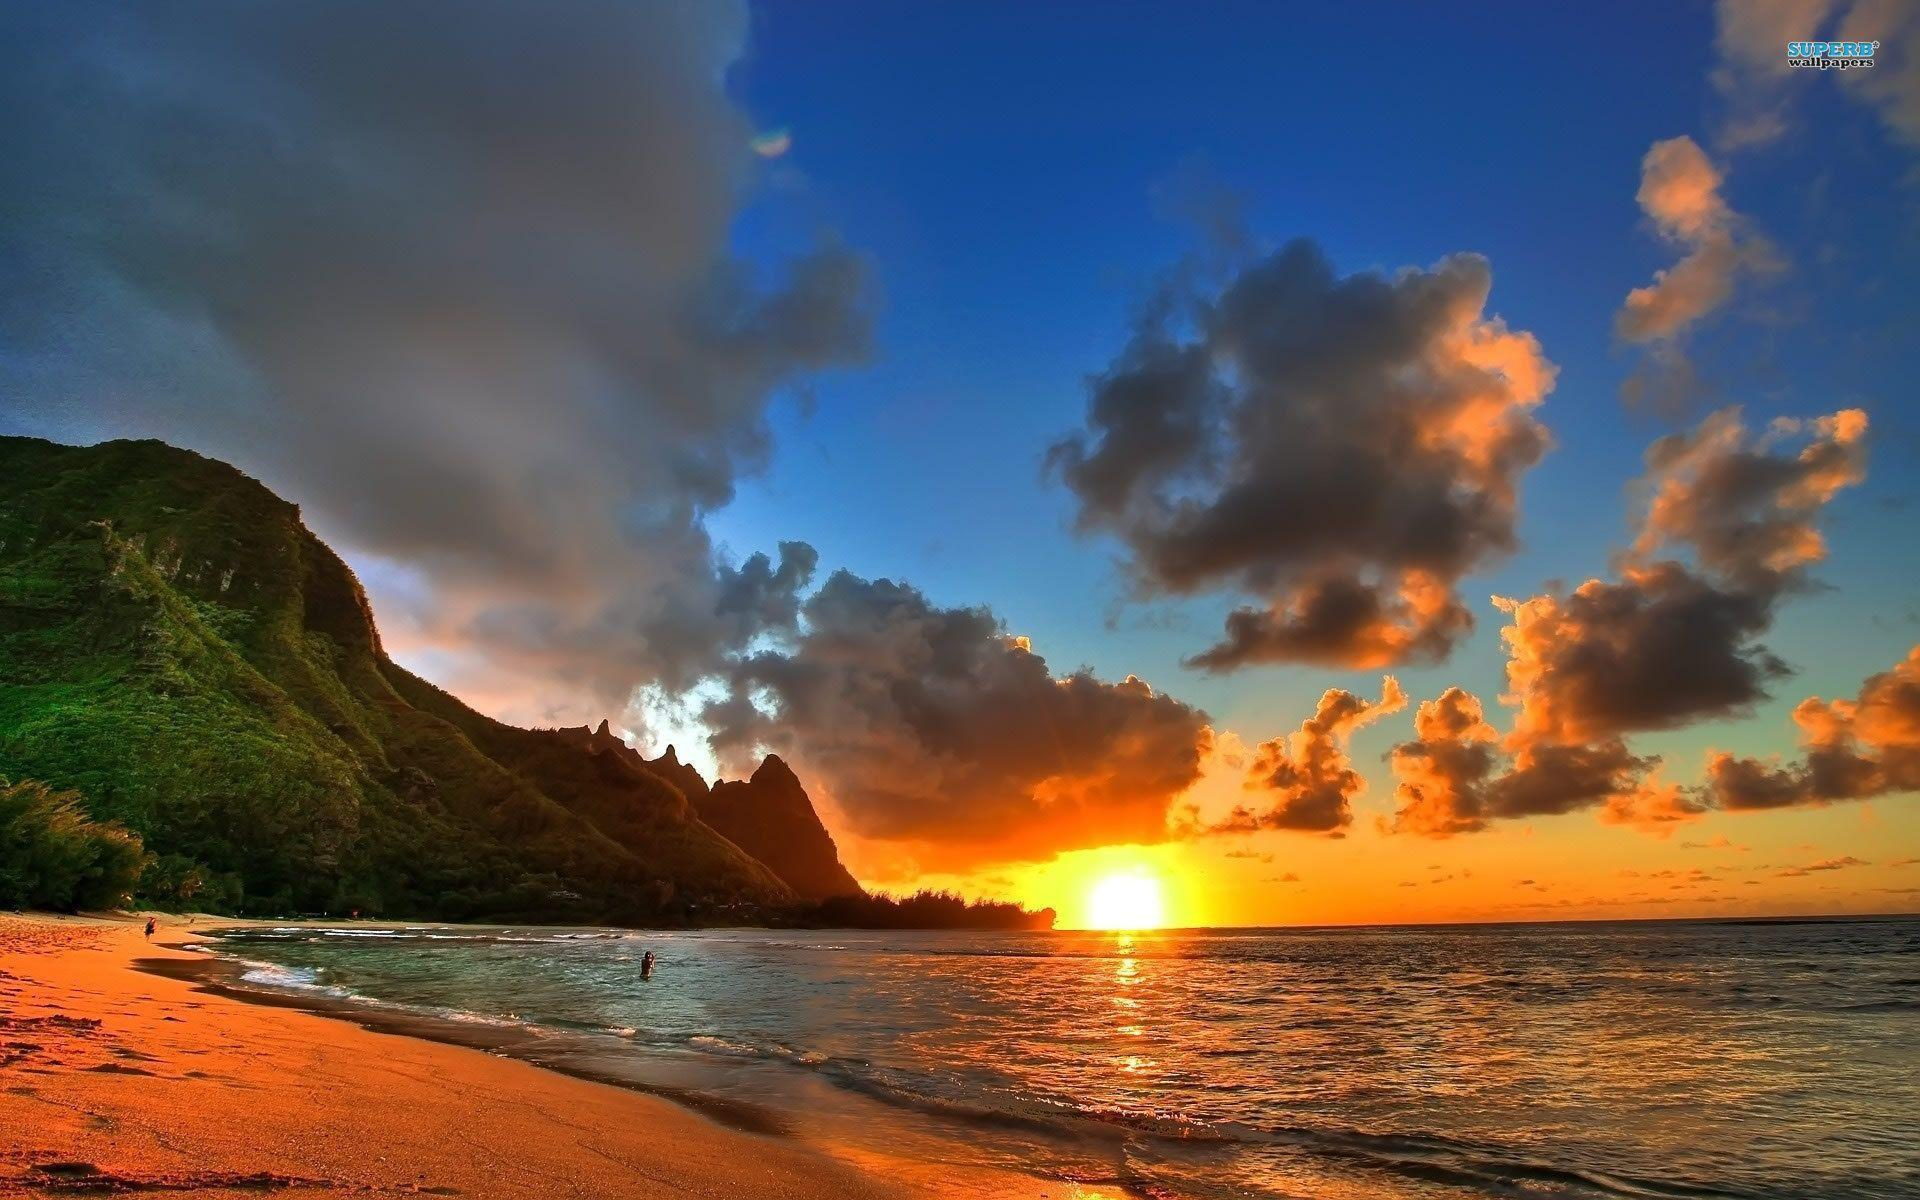 V.27: HD Images of Hawaii, Ultra HD 4K Hawaii Wallpapers